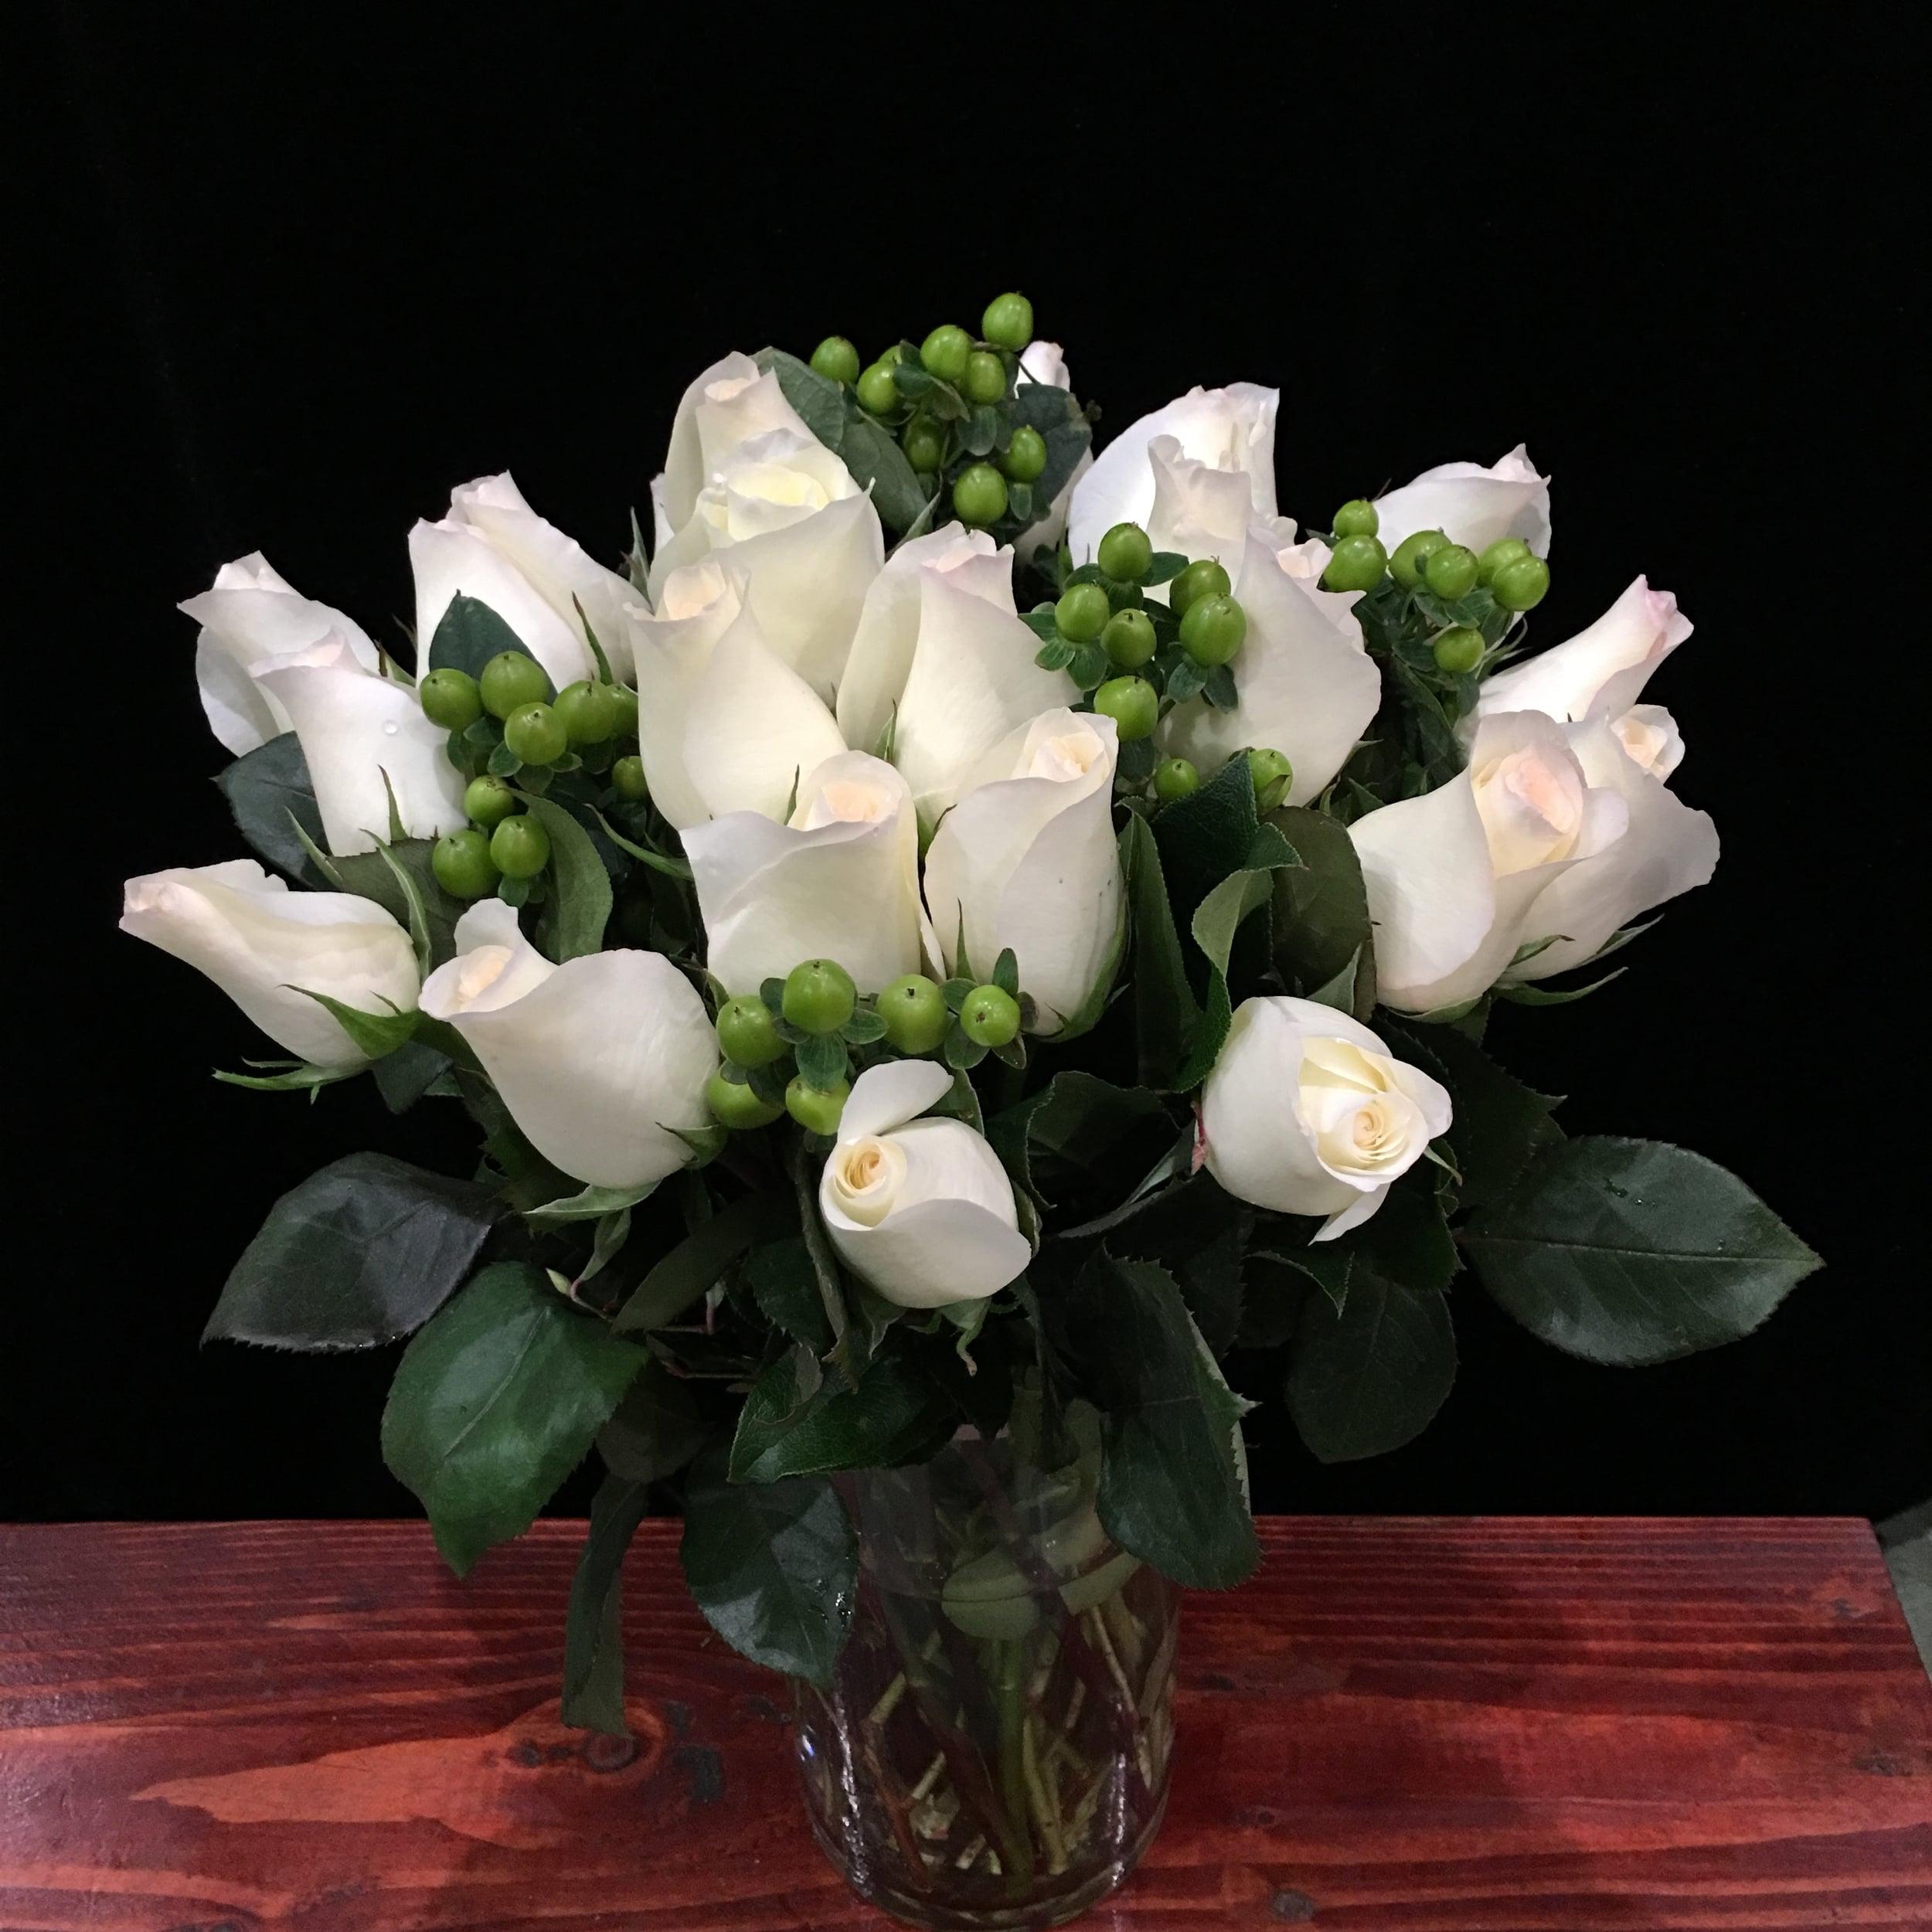 Two Dozen White Roses & Green Hypericum Berries